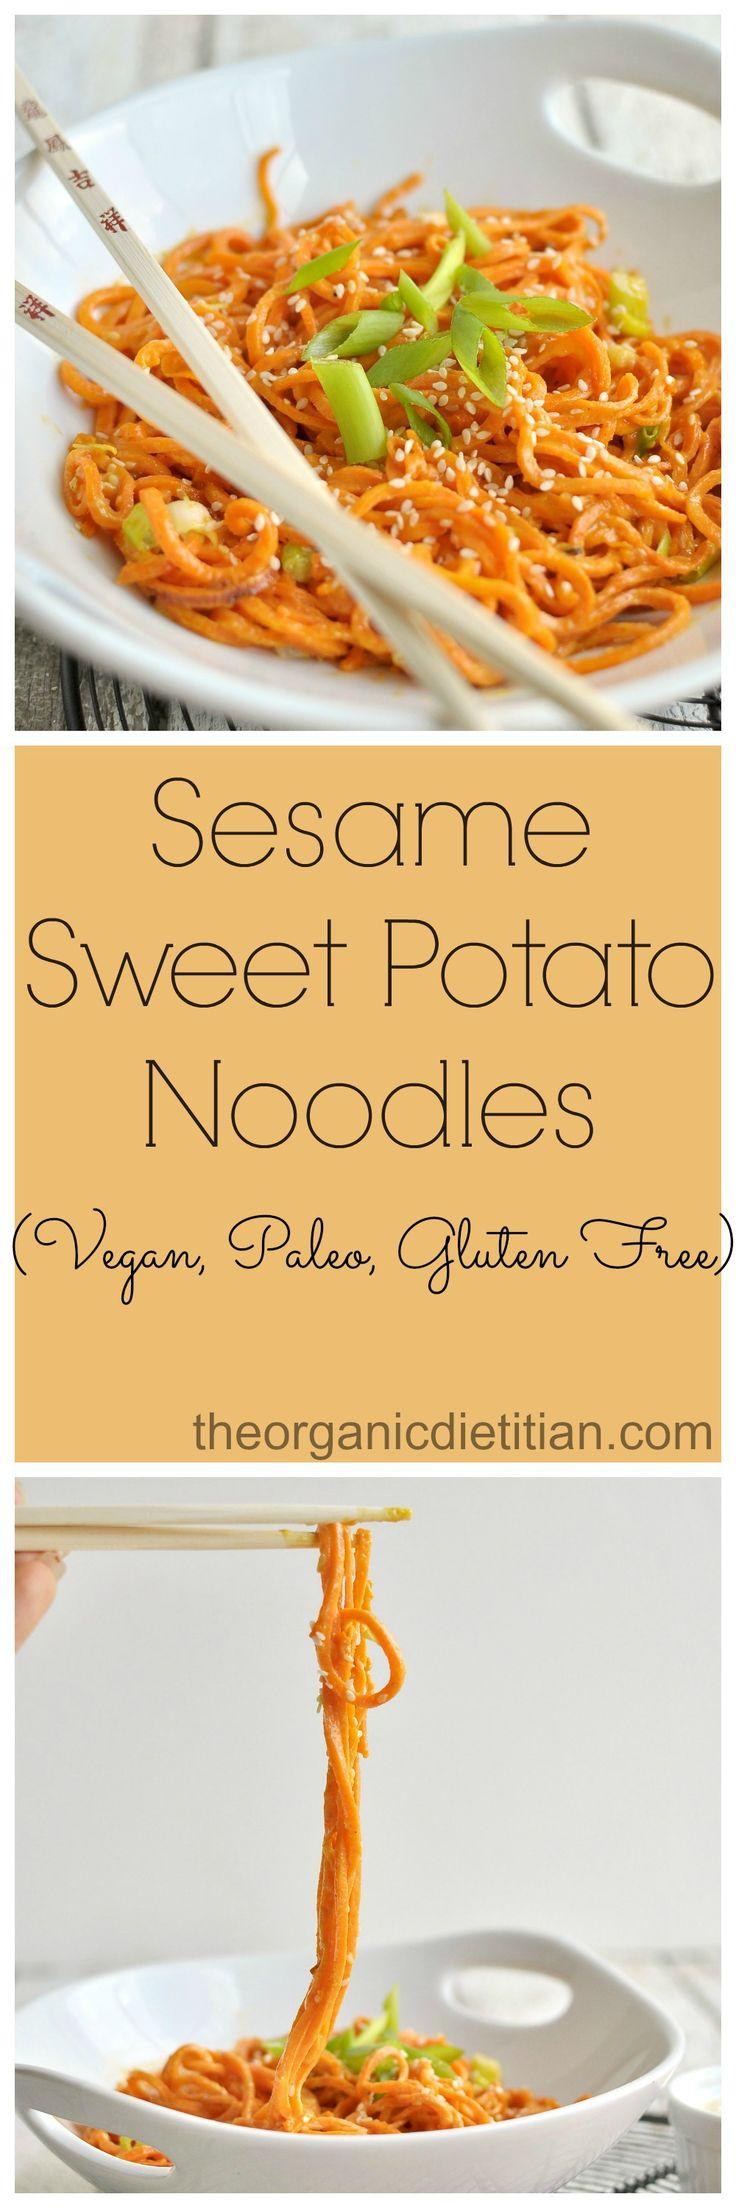 http://www.takhop.com/category/Vegetable-Spiralizer/ Sesame Sweet Potato Noodles using Spirilizer #vegan #glutenfree #paleo